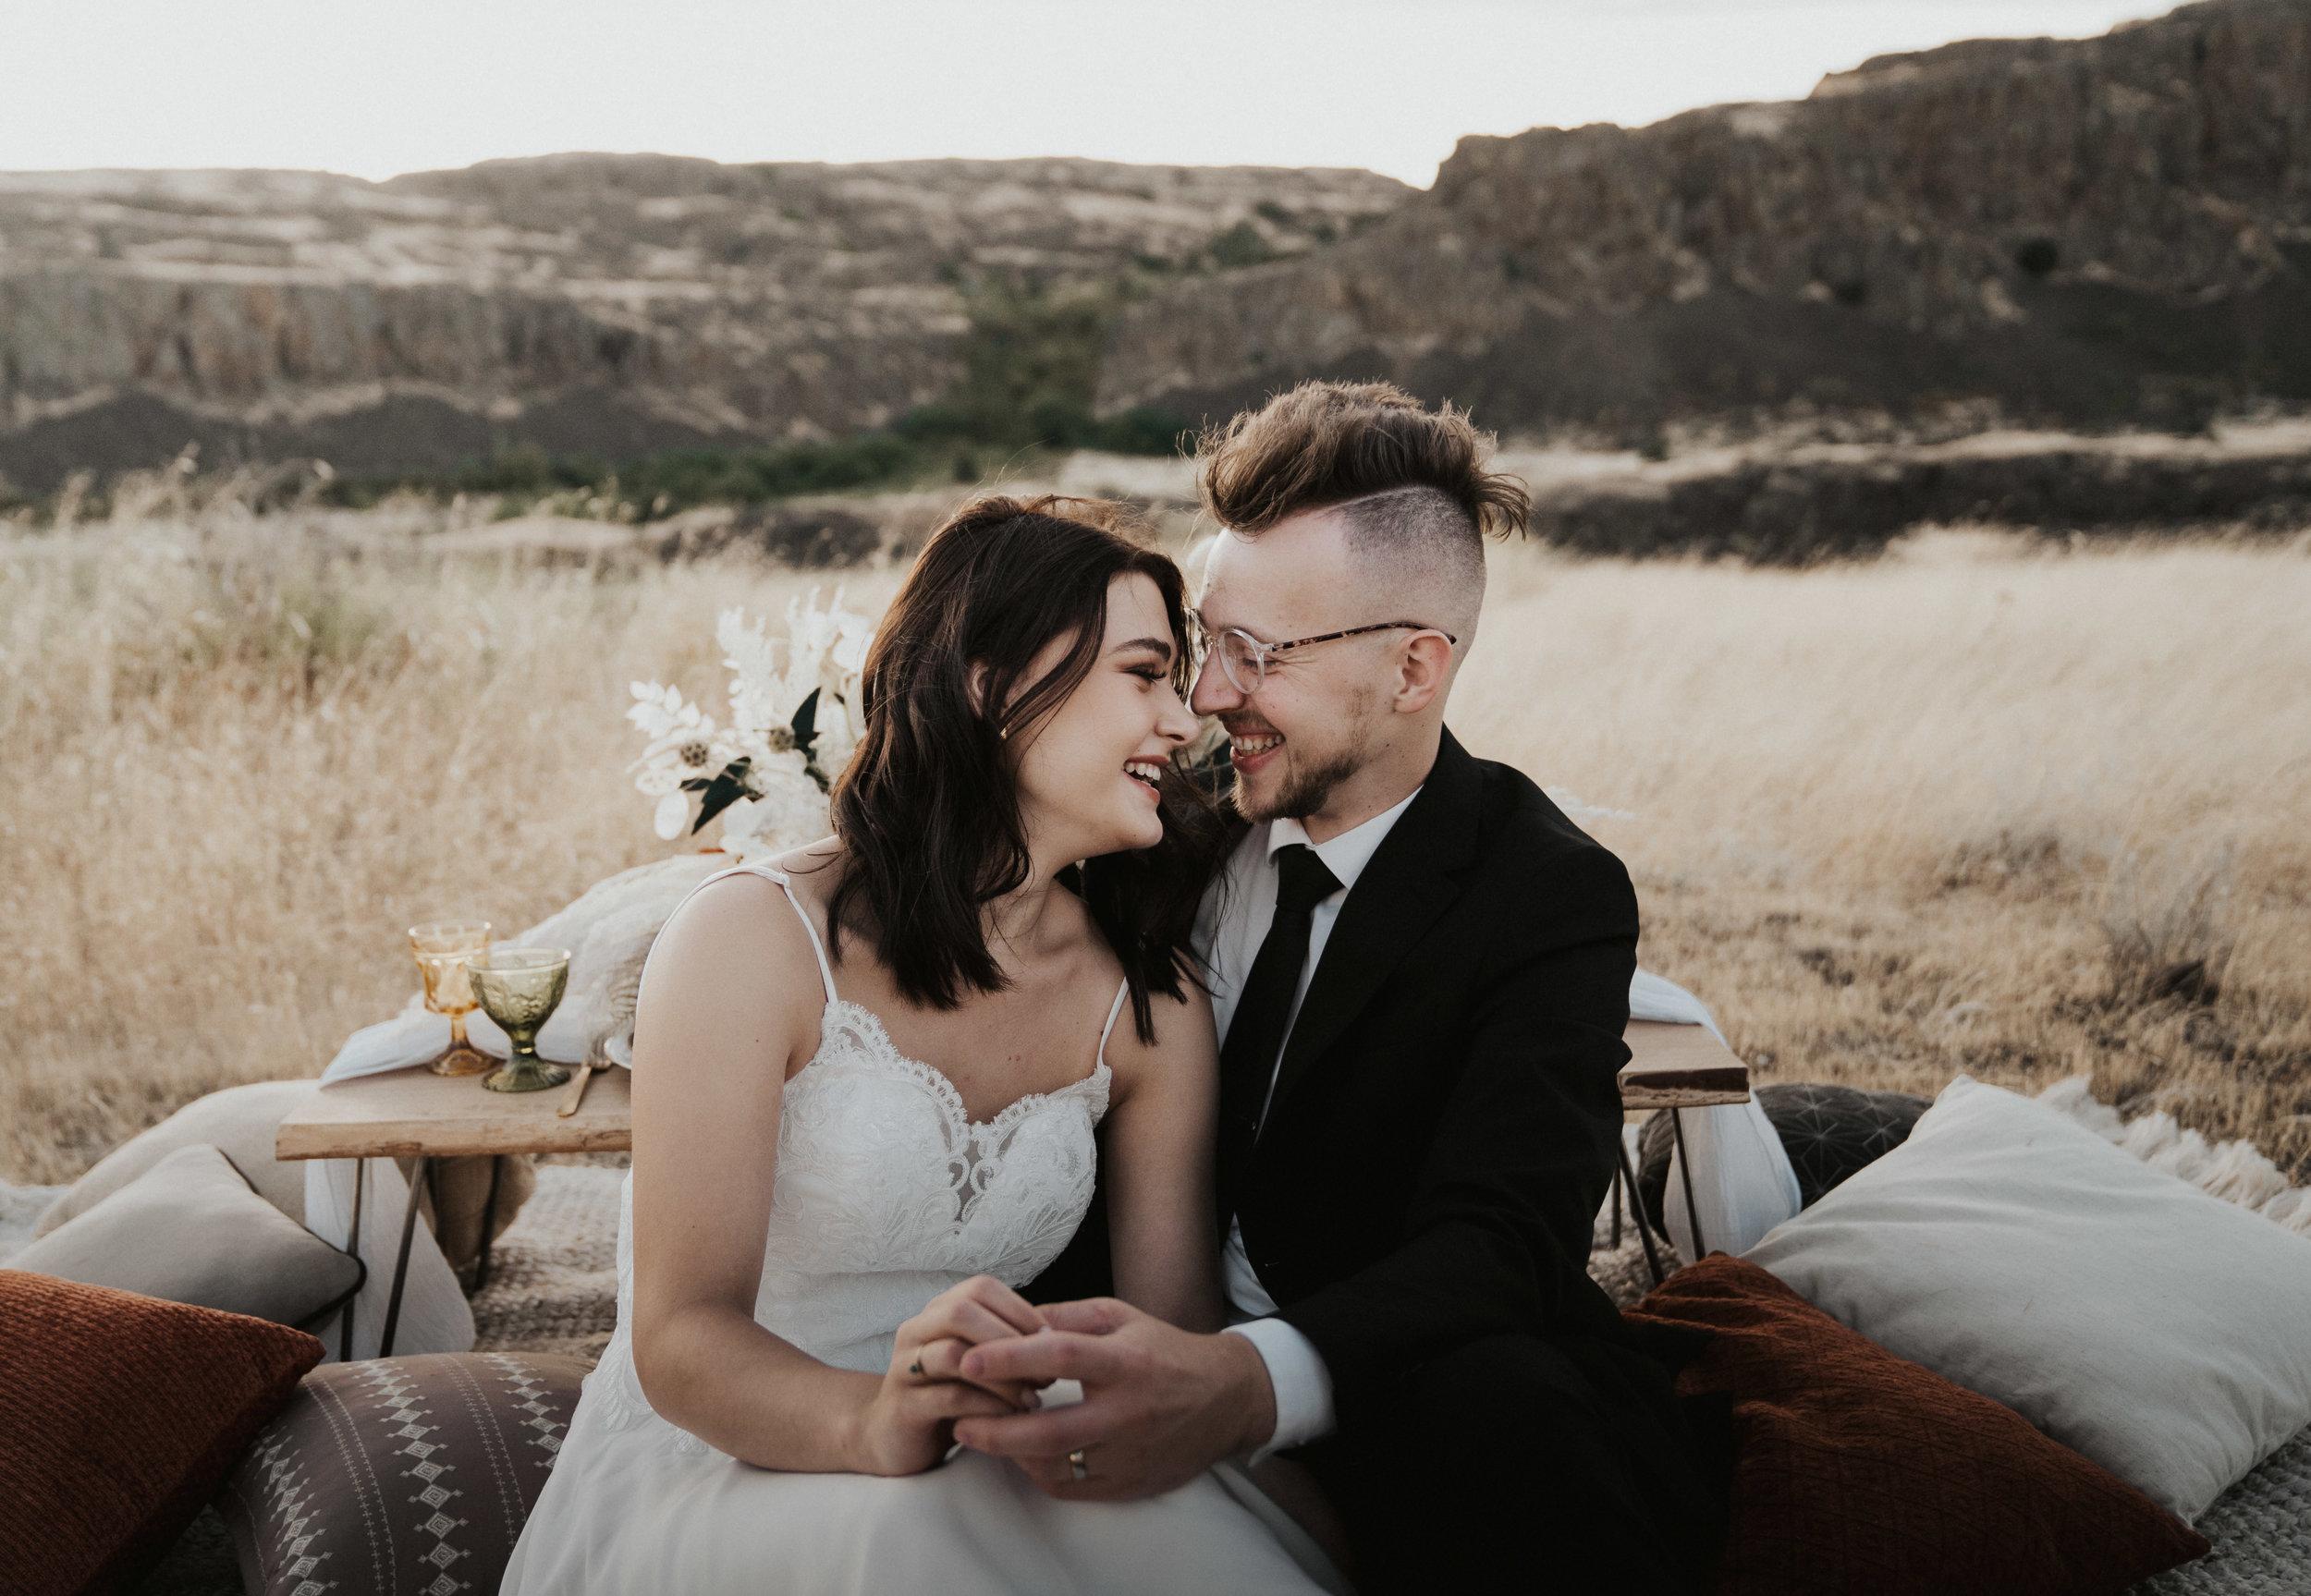 columbia-river-gorge-wedding-elopement-inspiration-5.jpg